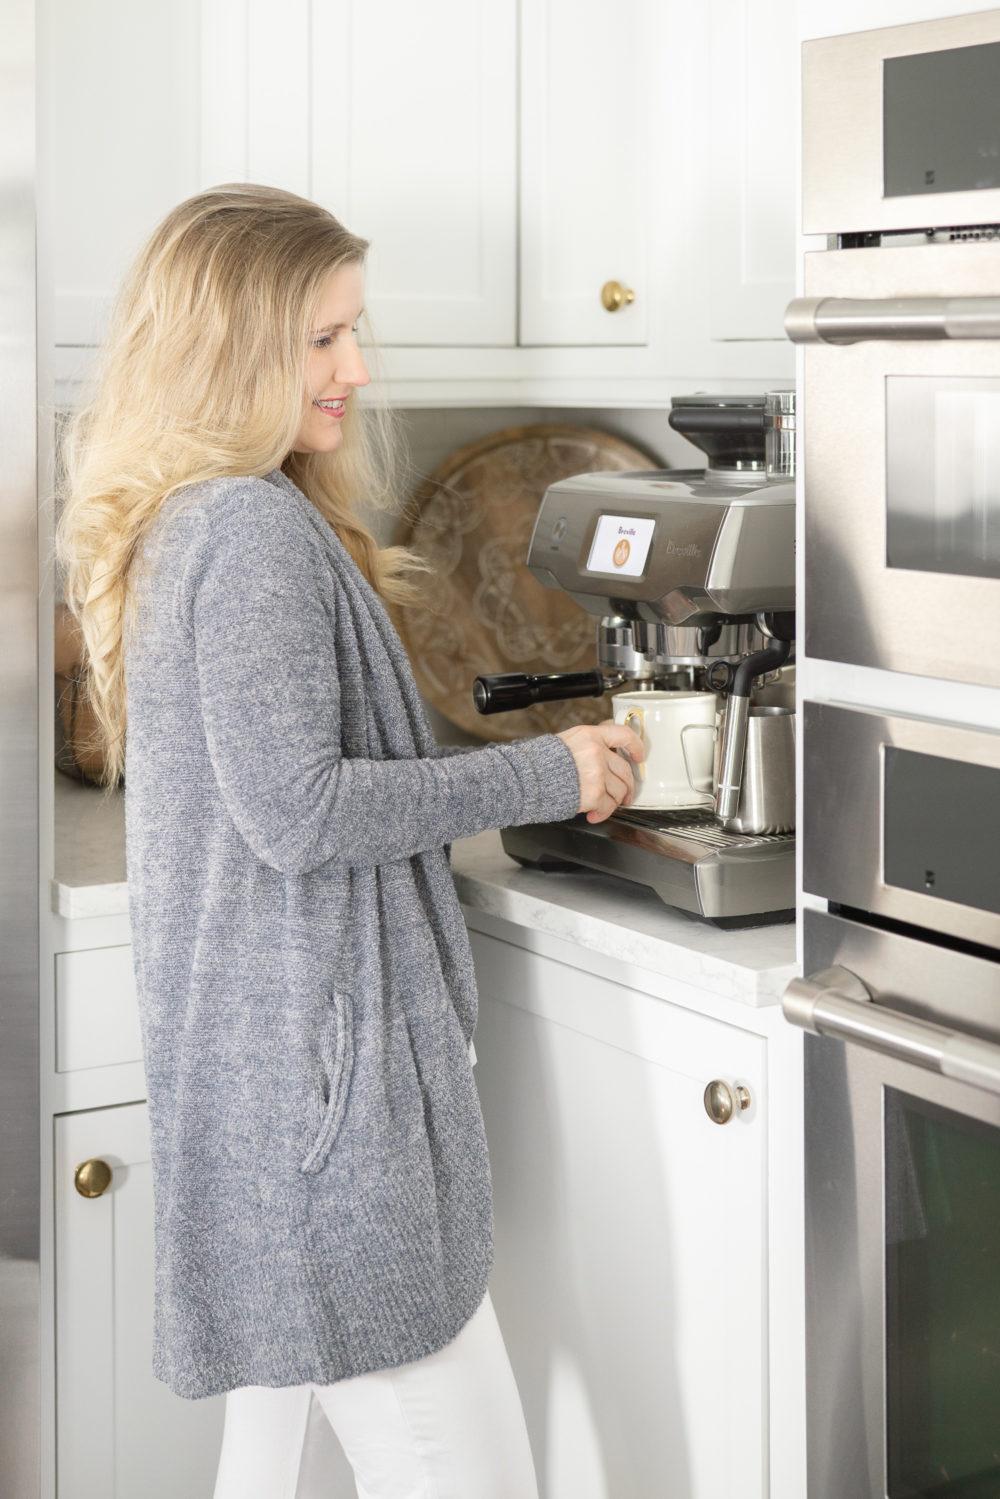 Petite Fashion Blog | eBay Home Appliances | Breville Barista Pro